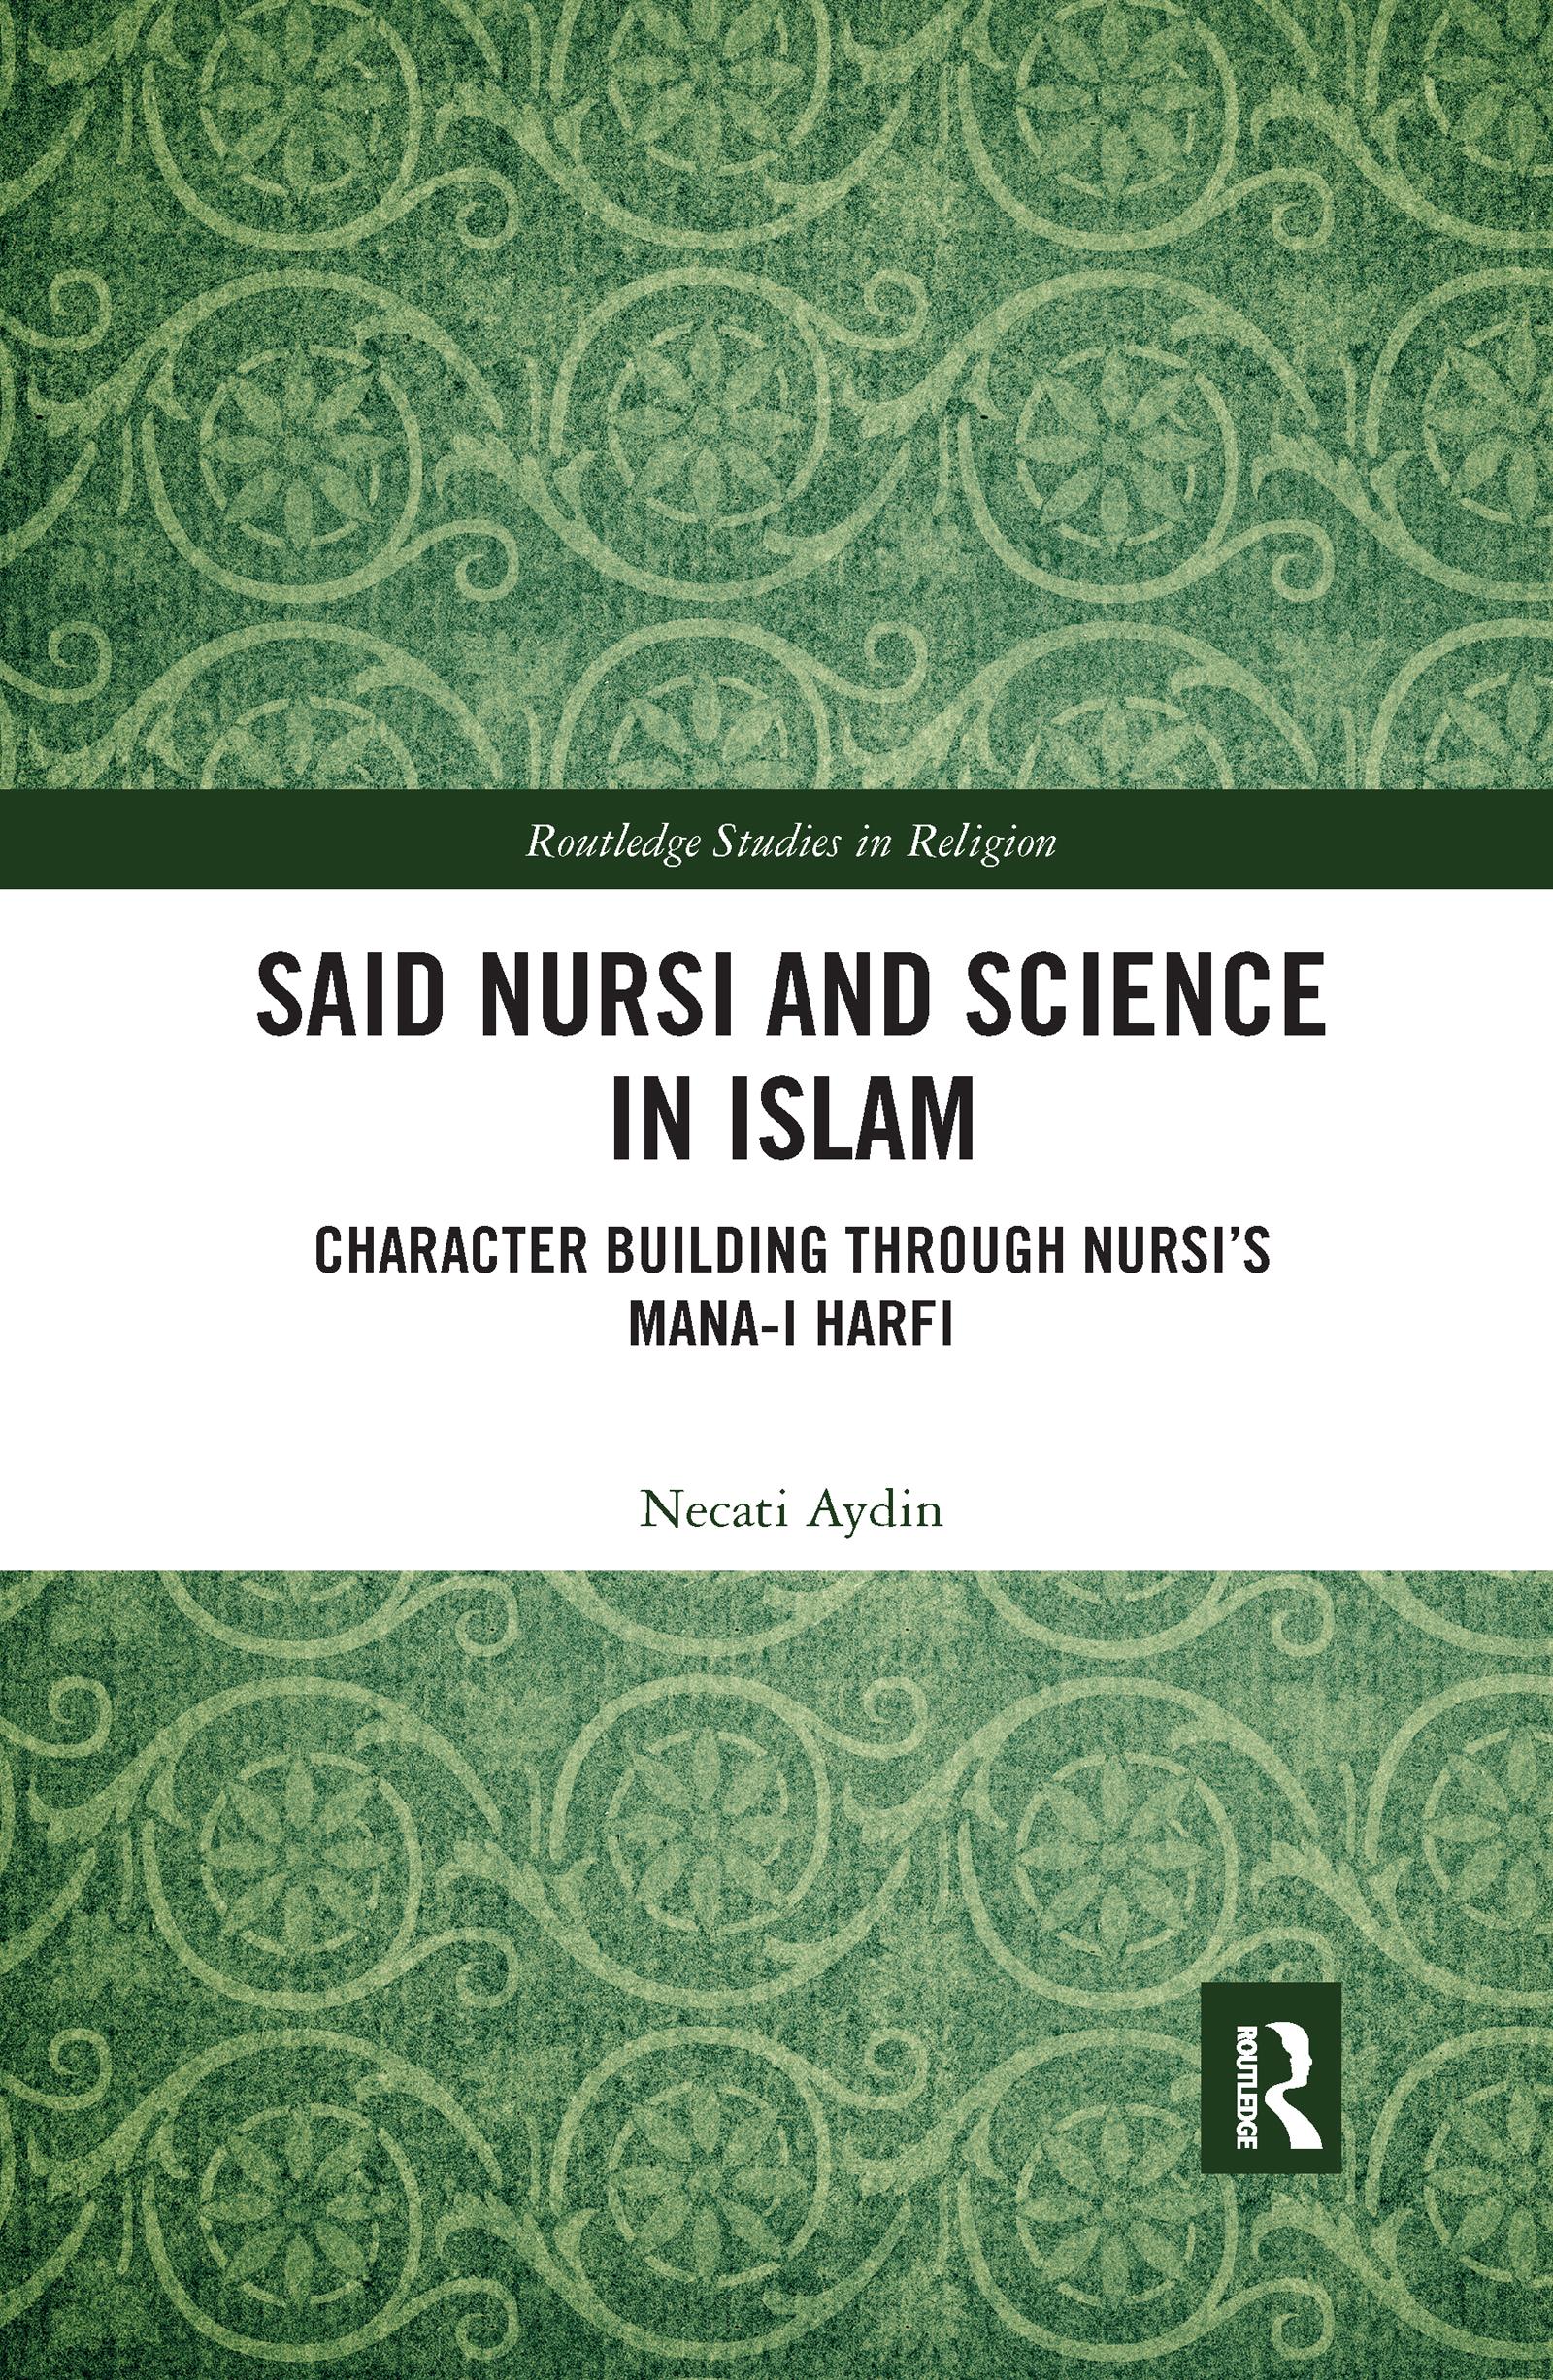 Said Nursi and Science in Islam